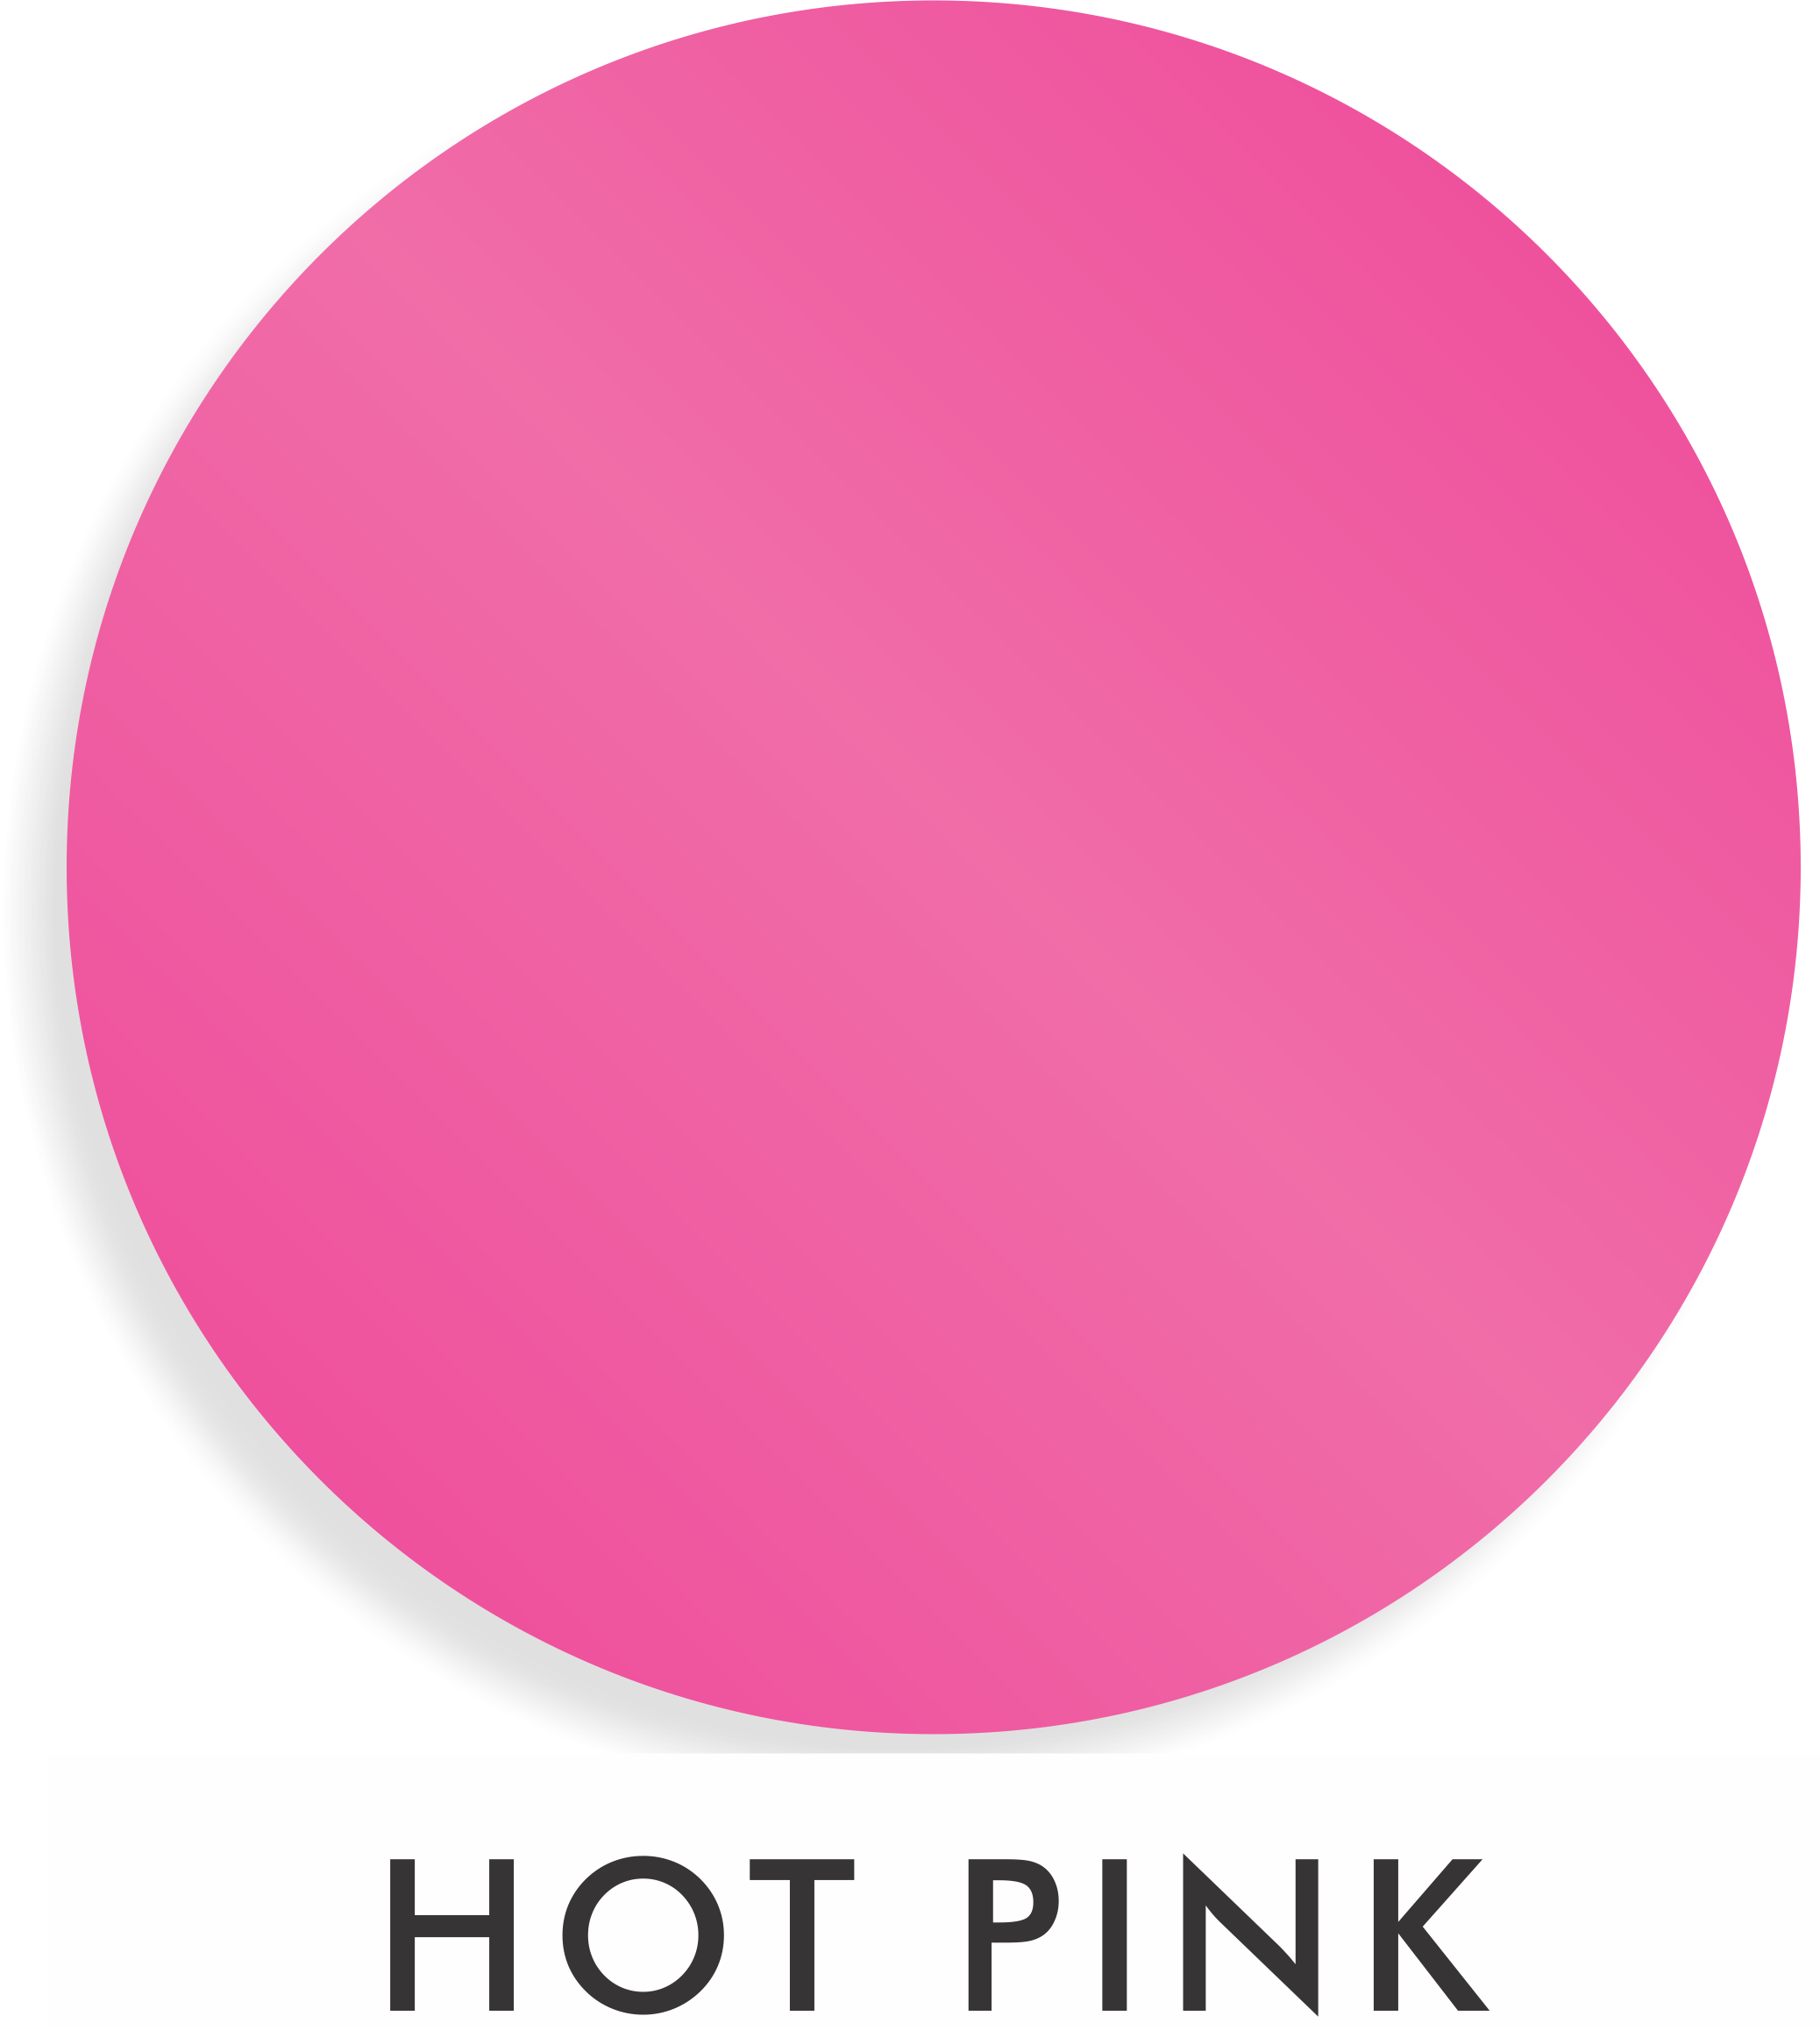 HOT PINK FOIL.png